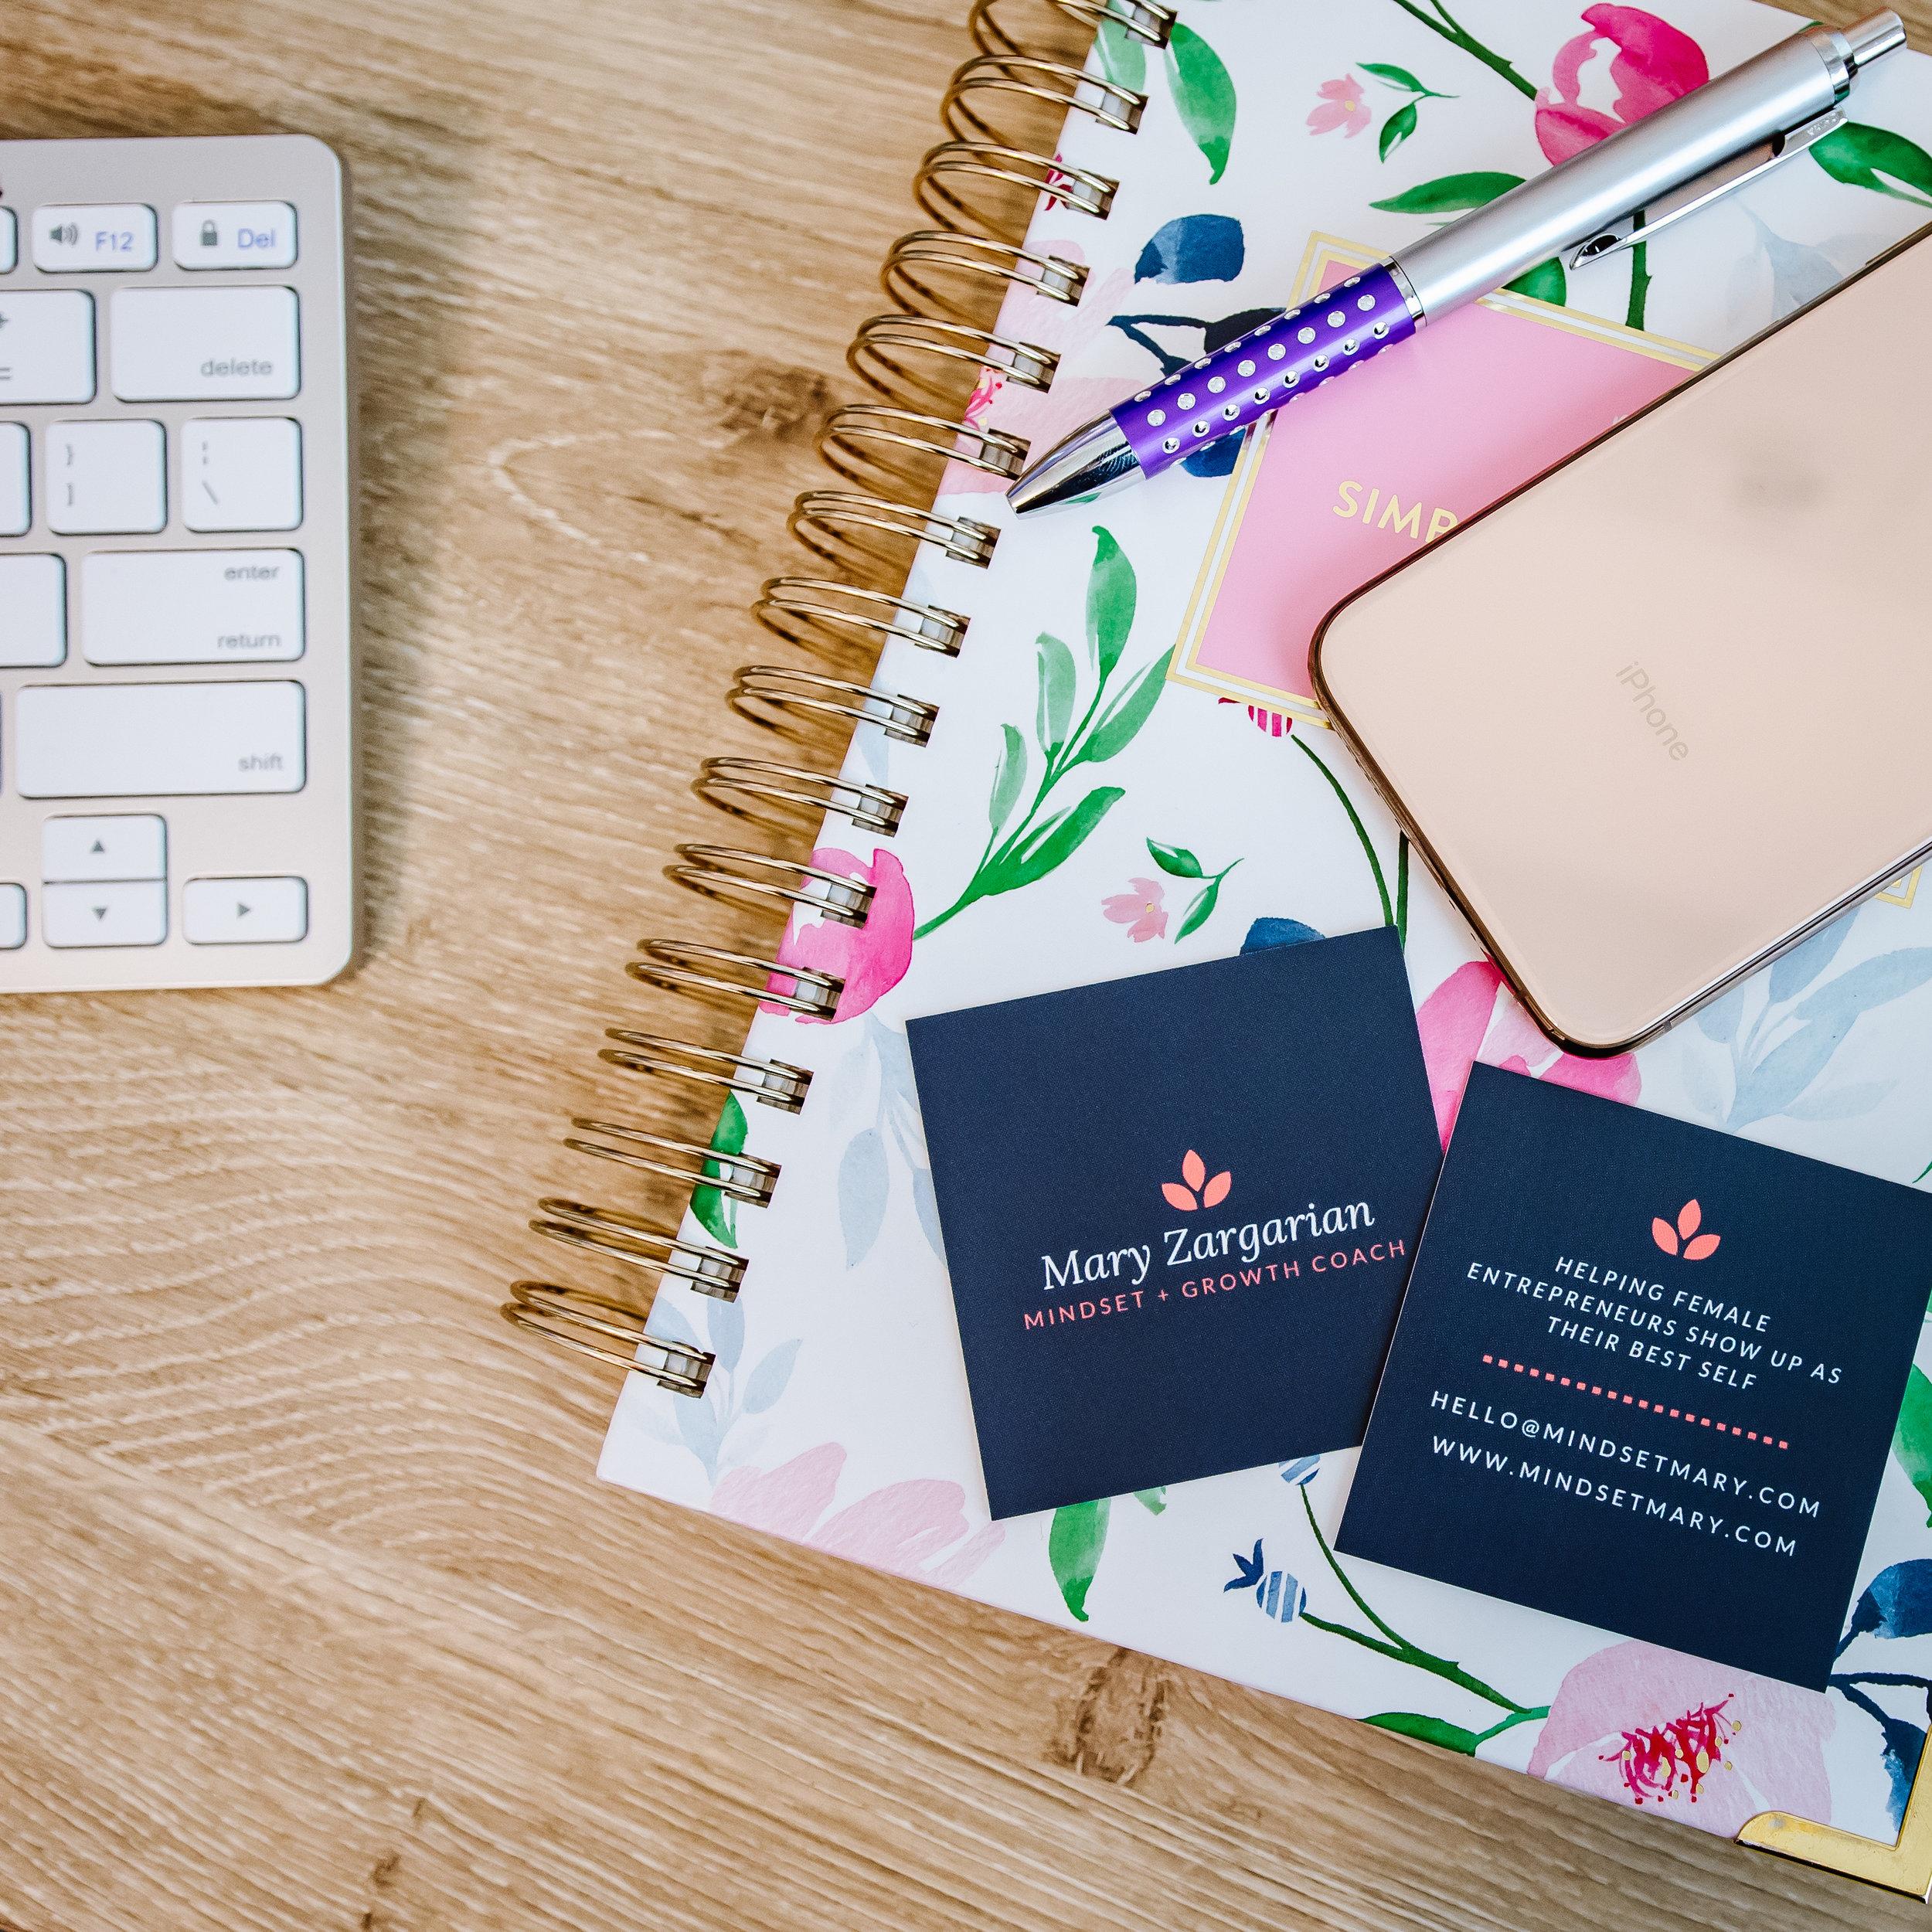 planning branding photo flatlay